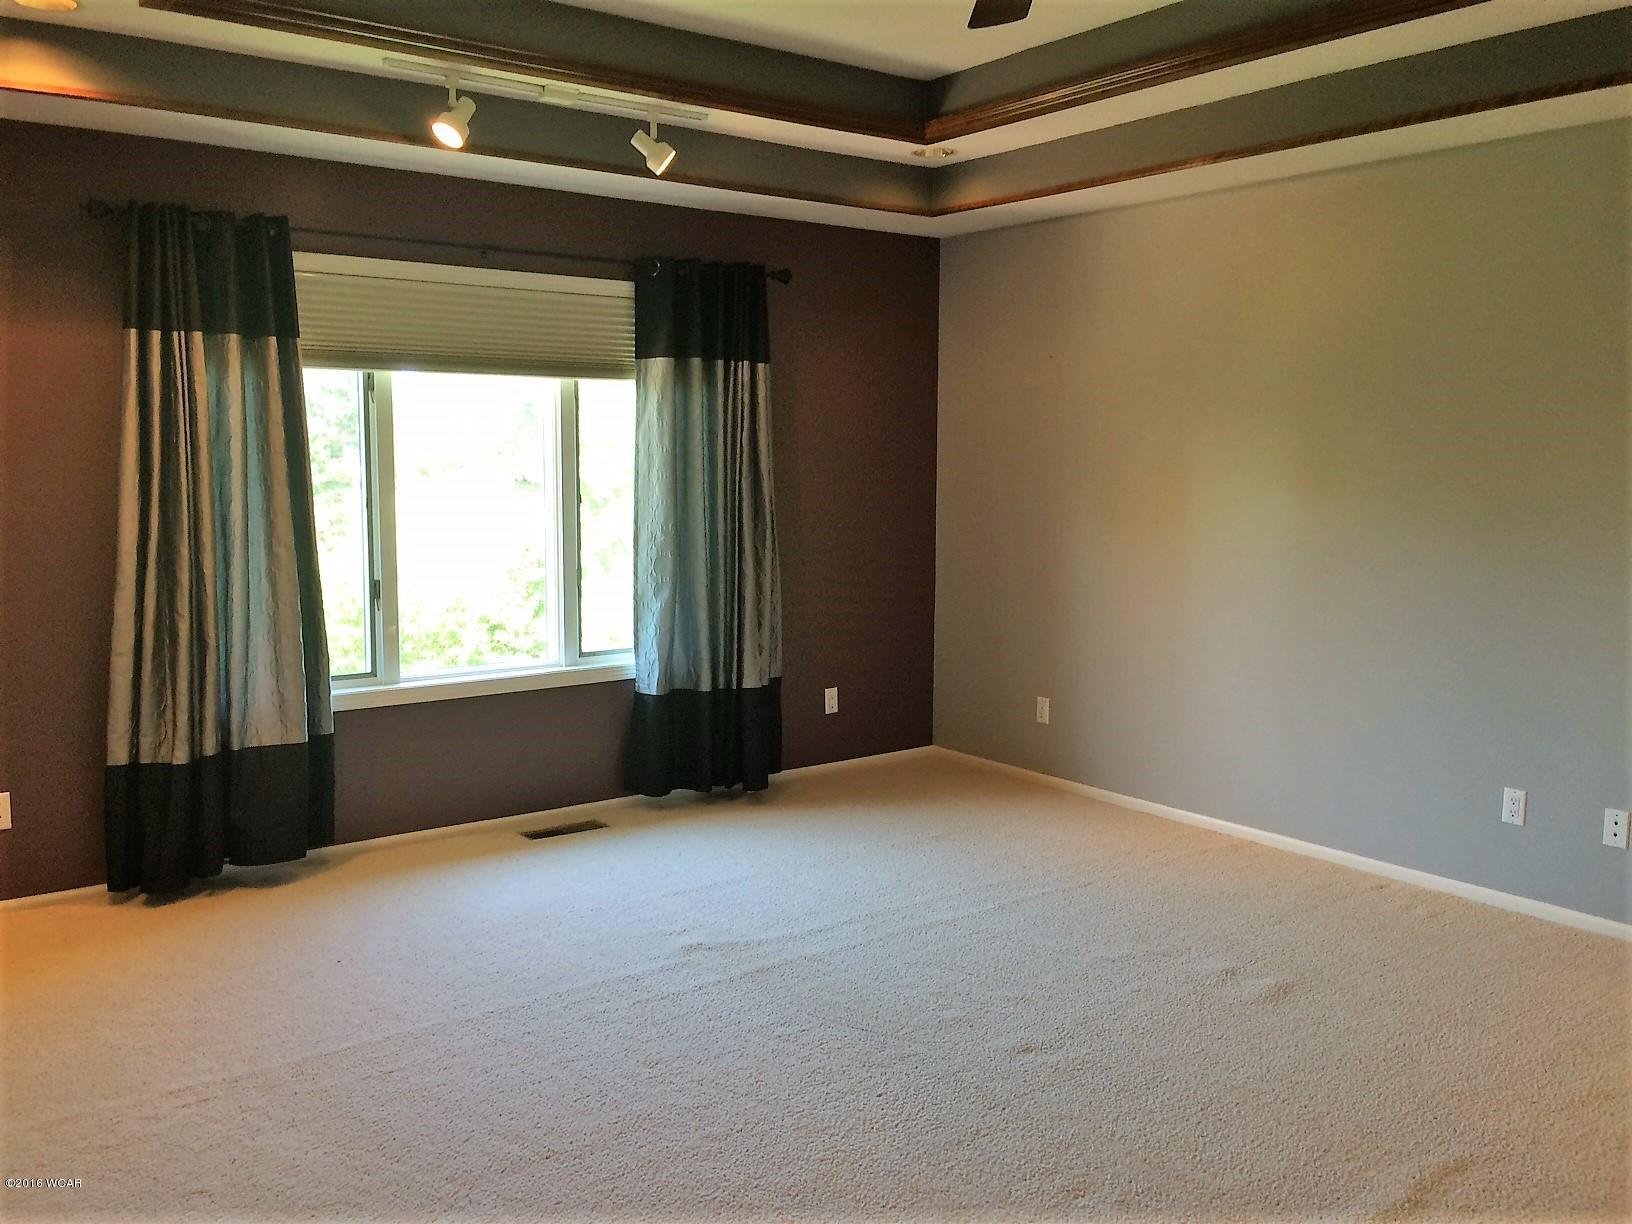 3037 E Eagle Ridge Drive,Willmar,5 Bedrooms Bedrooms,5 BathroomsBathrooms,Single Family,E Eagle Ridge Drive,6023861